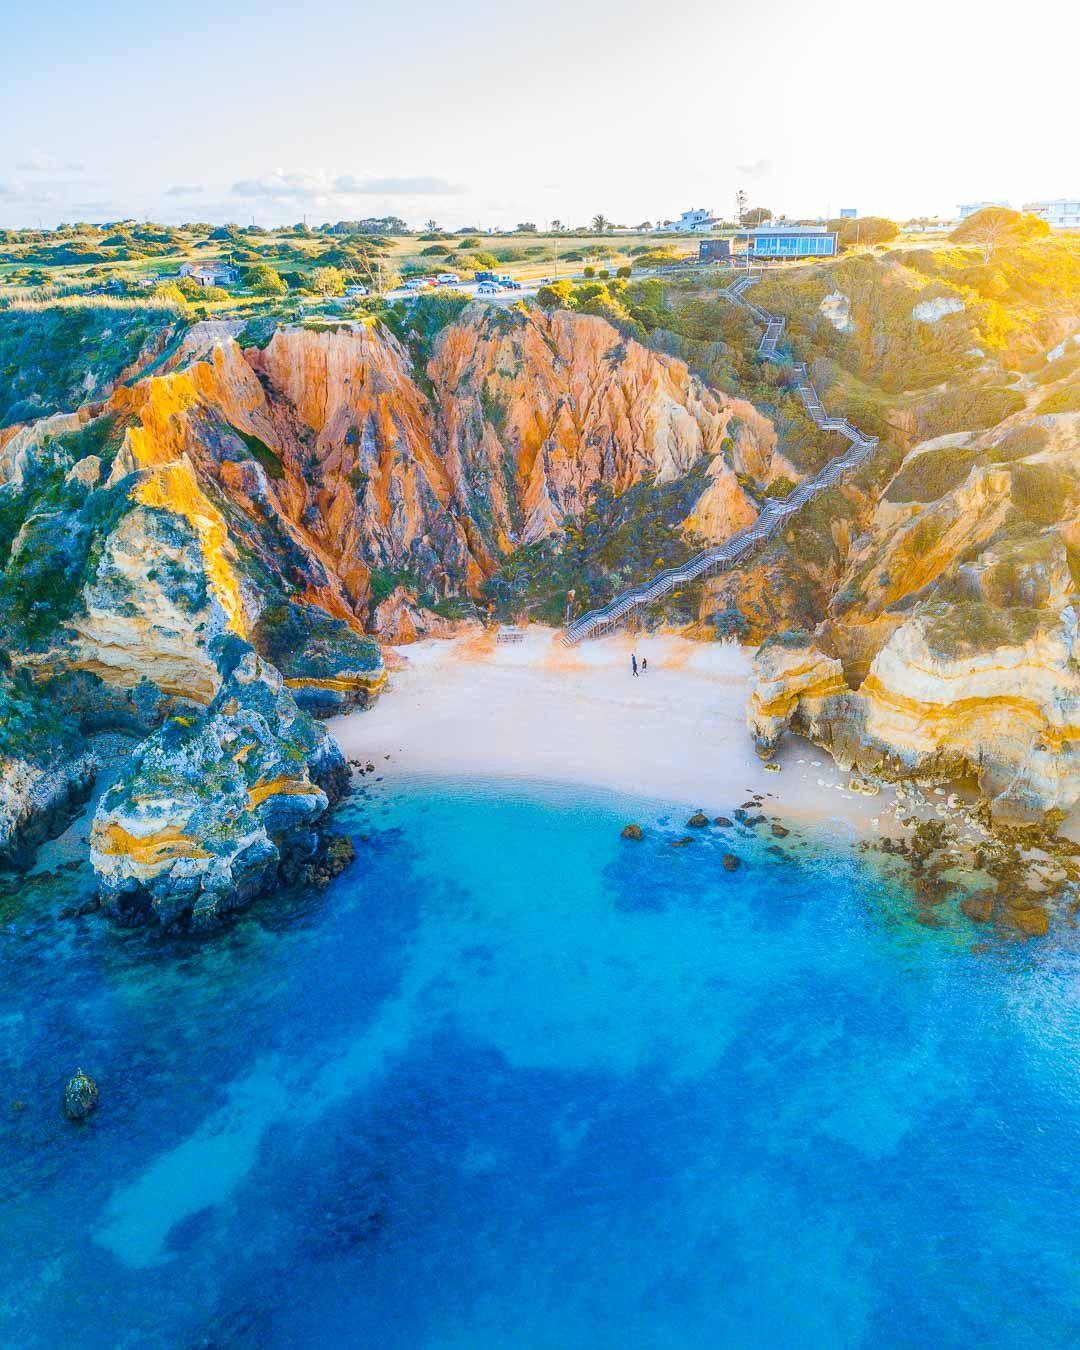 Praia Do Camilo 225 Steps To Paradise Kevmrc Com Cool Places To Visit Algarve Portugal Prettiest Beach